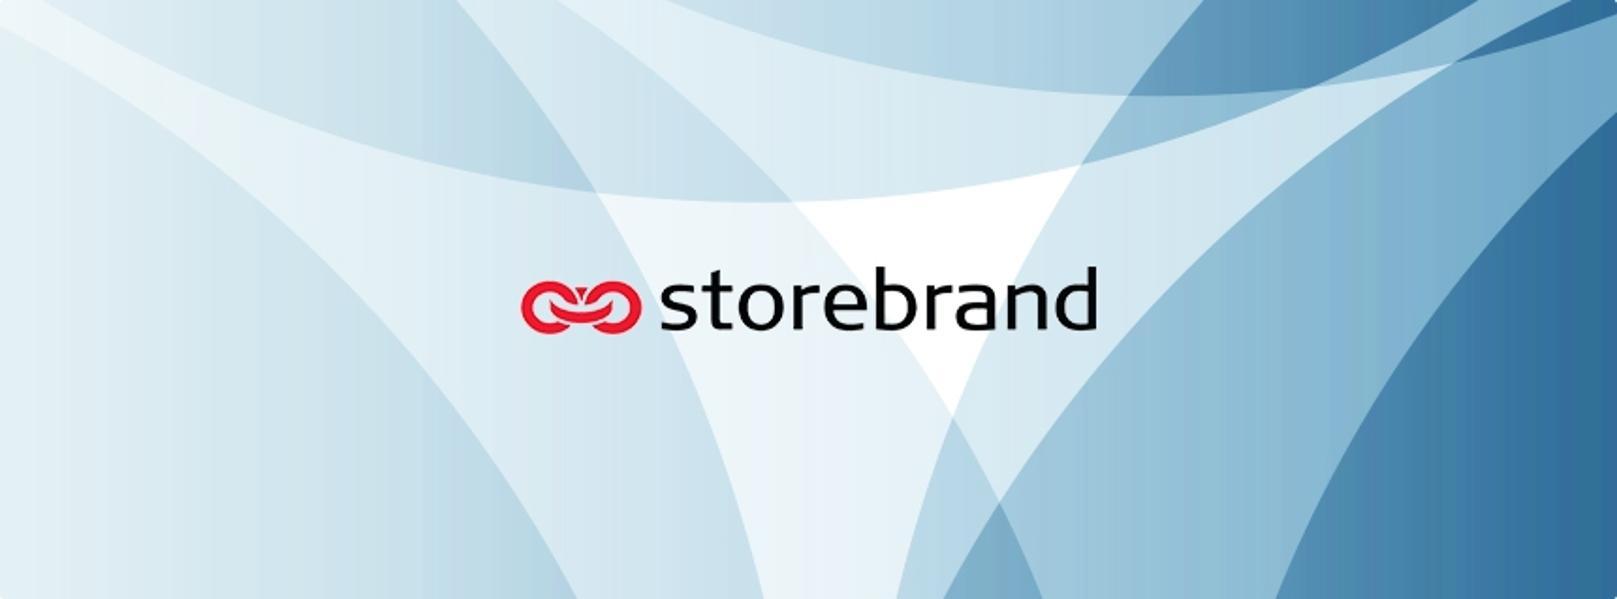 Storebrand Travel Insurance